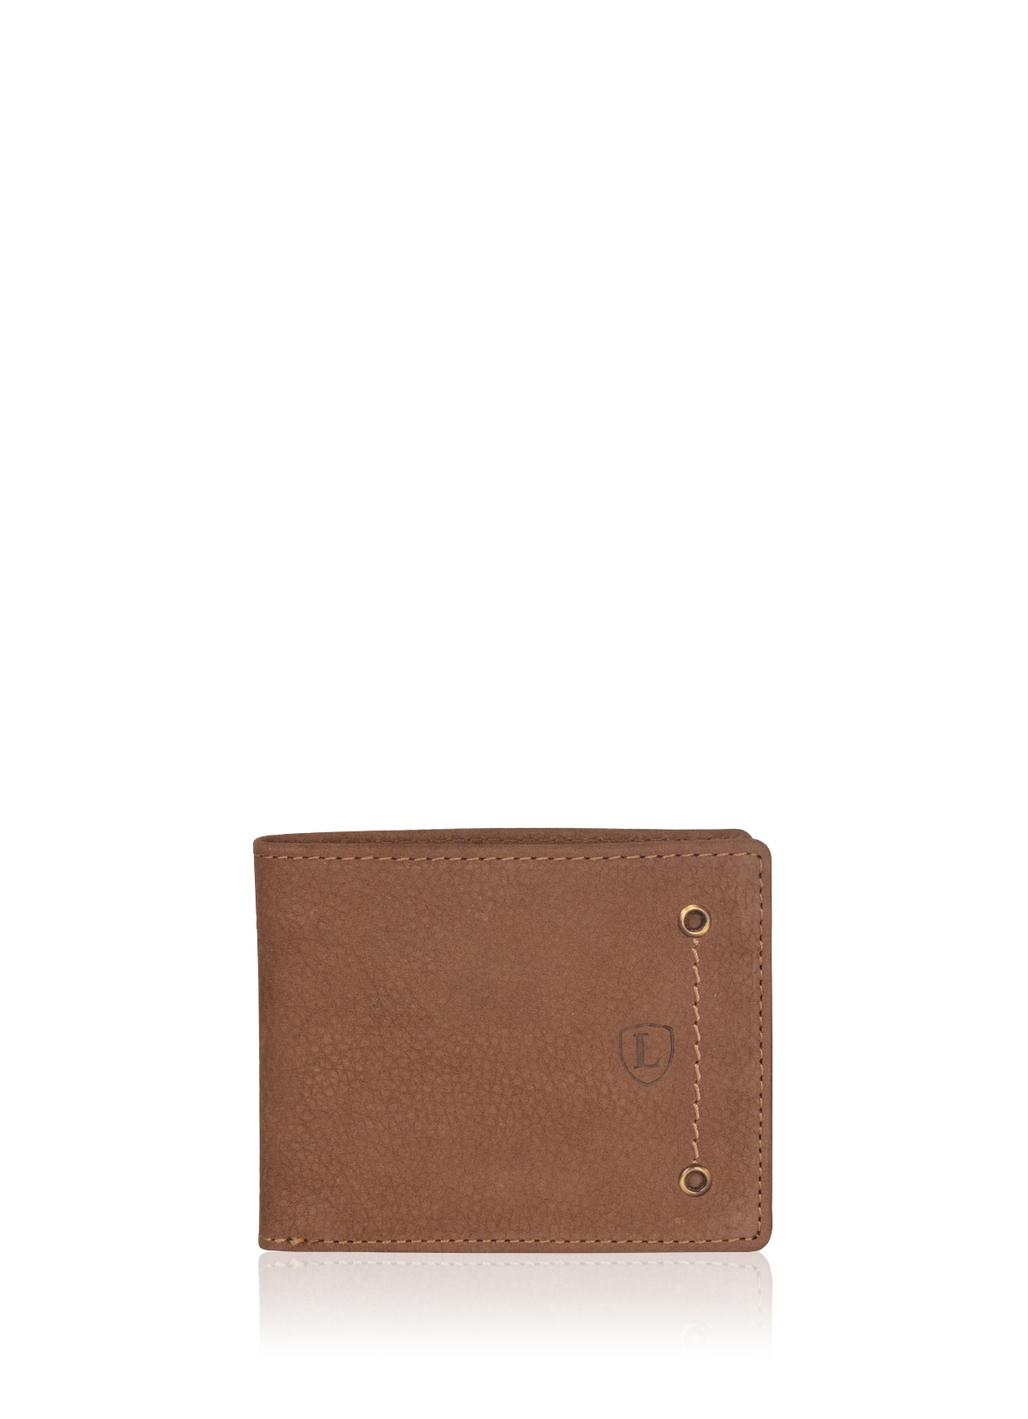 Edward Bi-Fold Leather Wallet in Coffee Brown